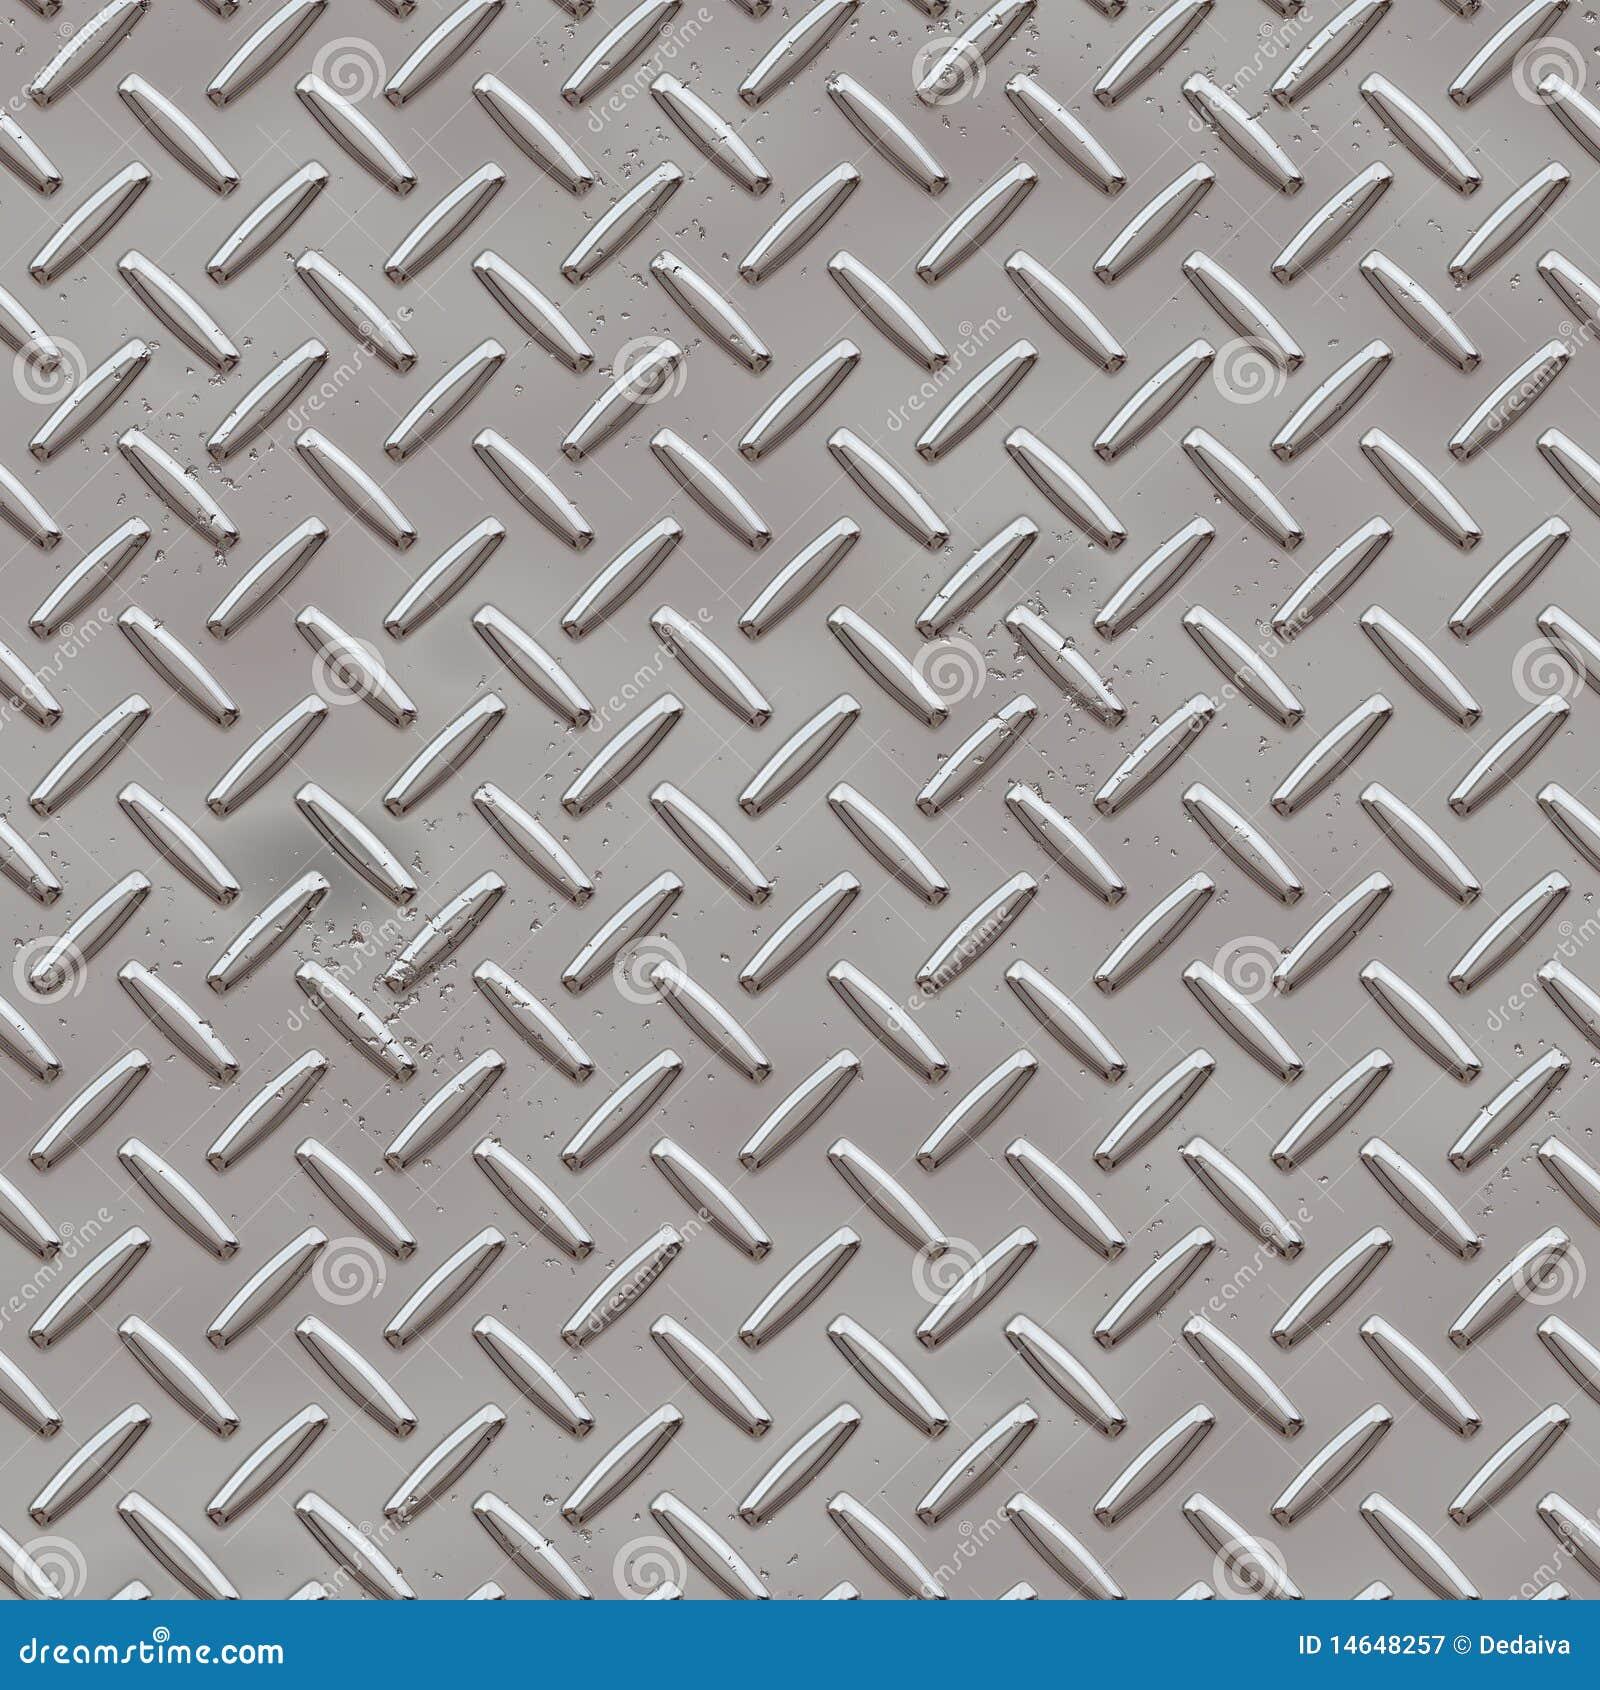 diamond-plate-14648257.jpg